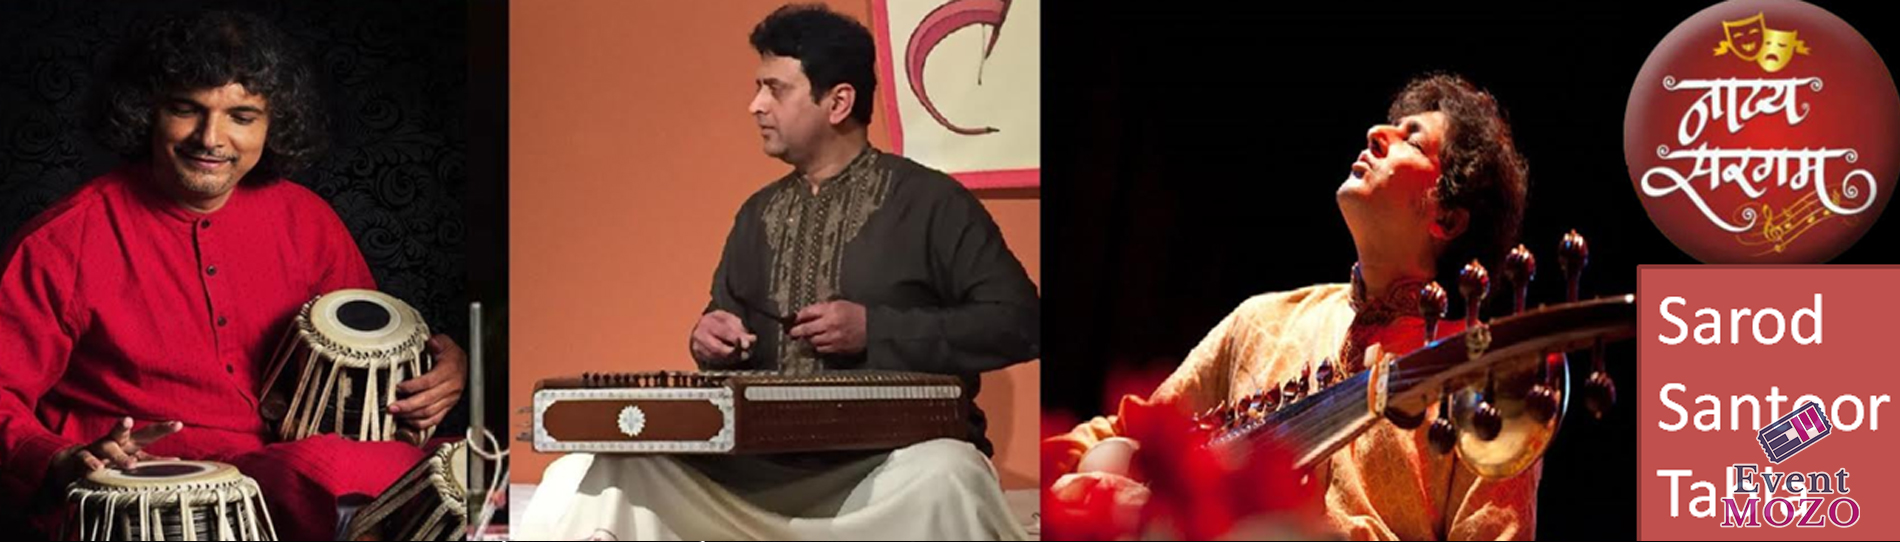 EventMozo Twiligh Melodies - Partho Sarathy on Sarod, Madan Oak on S....